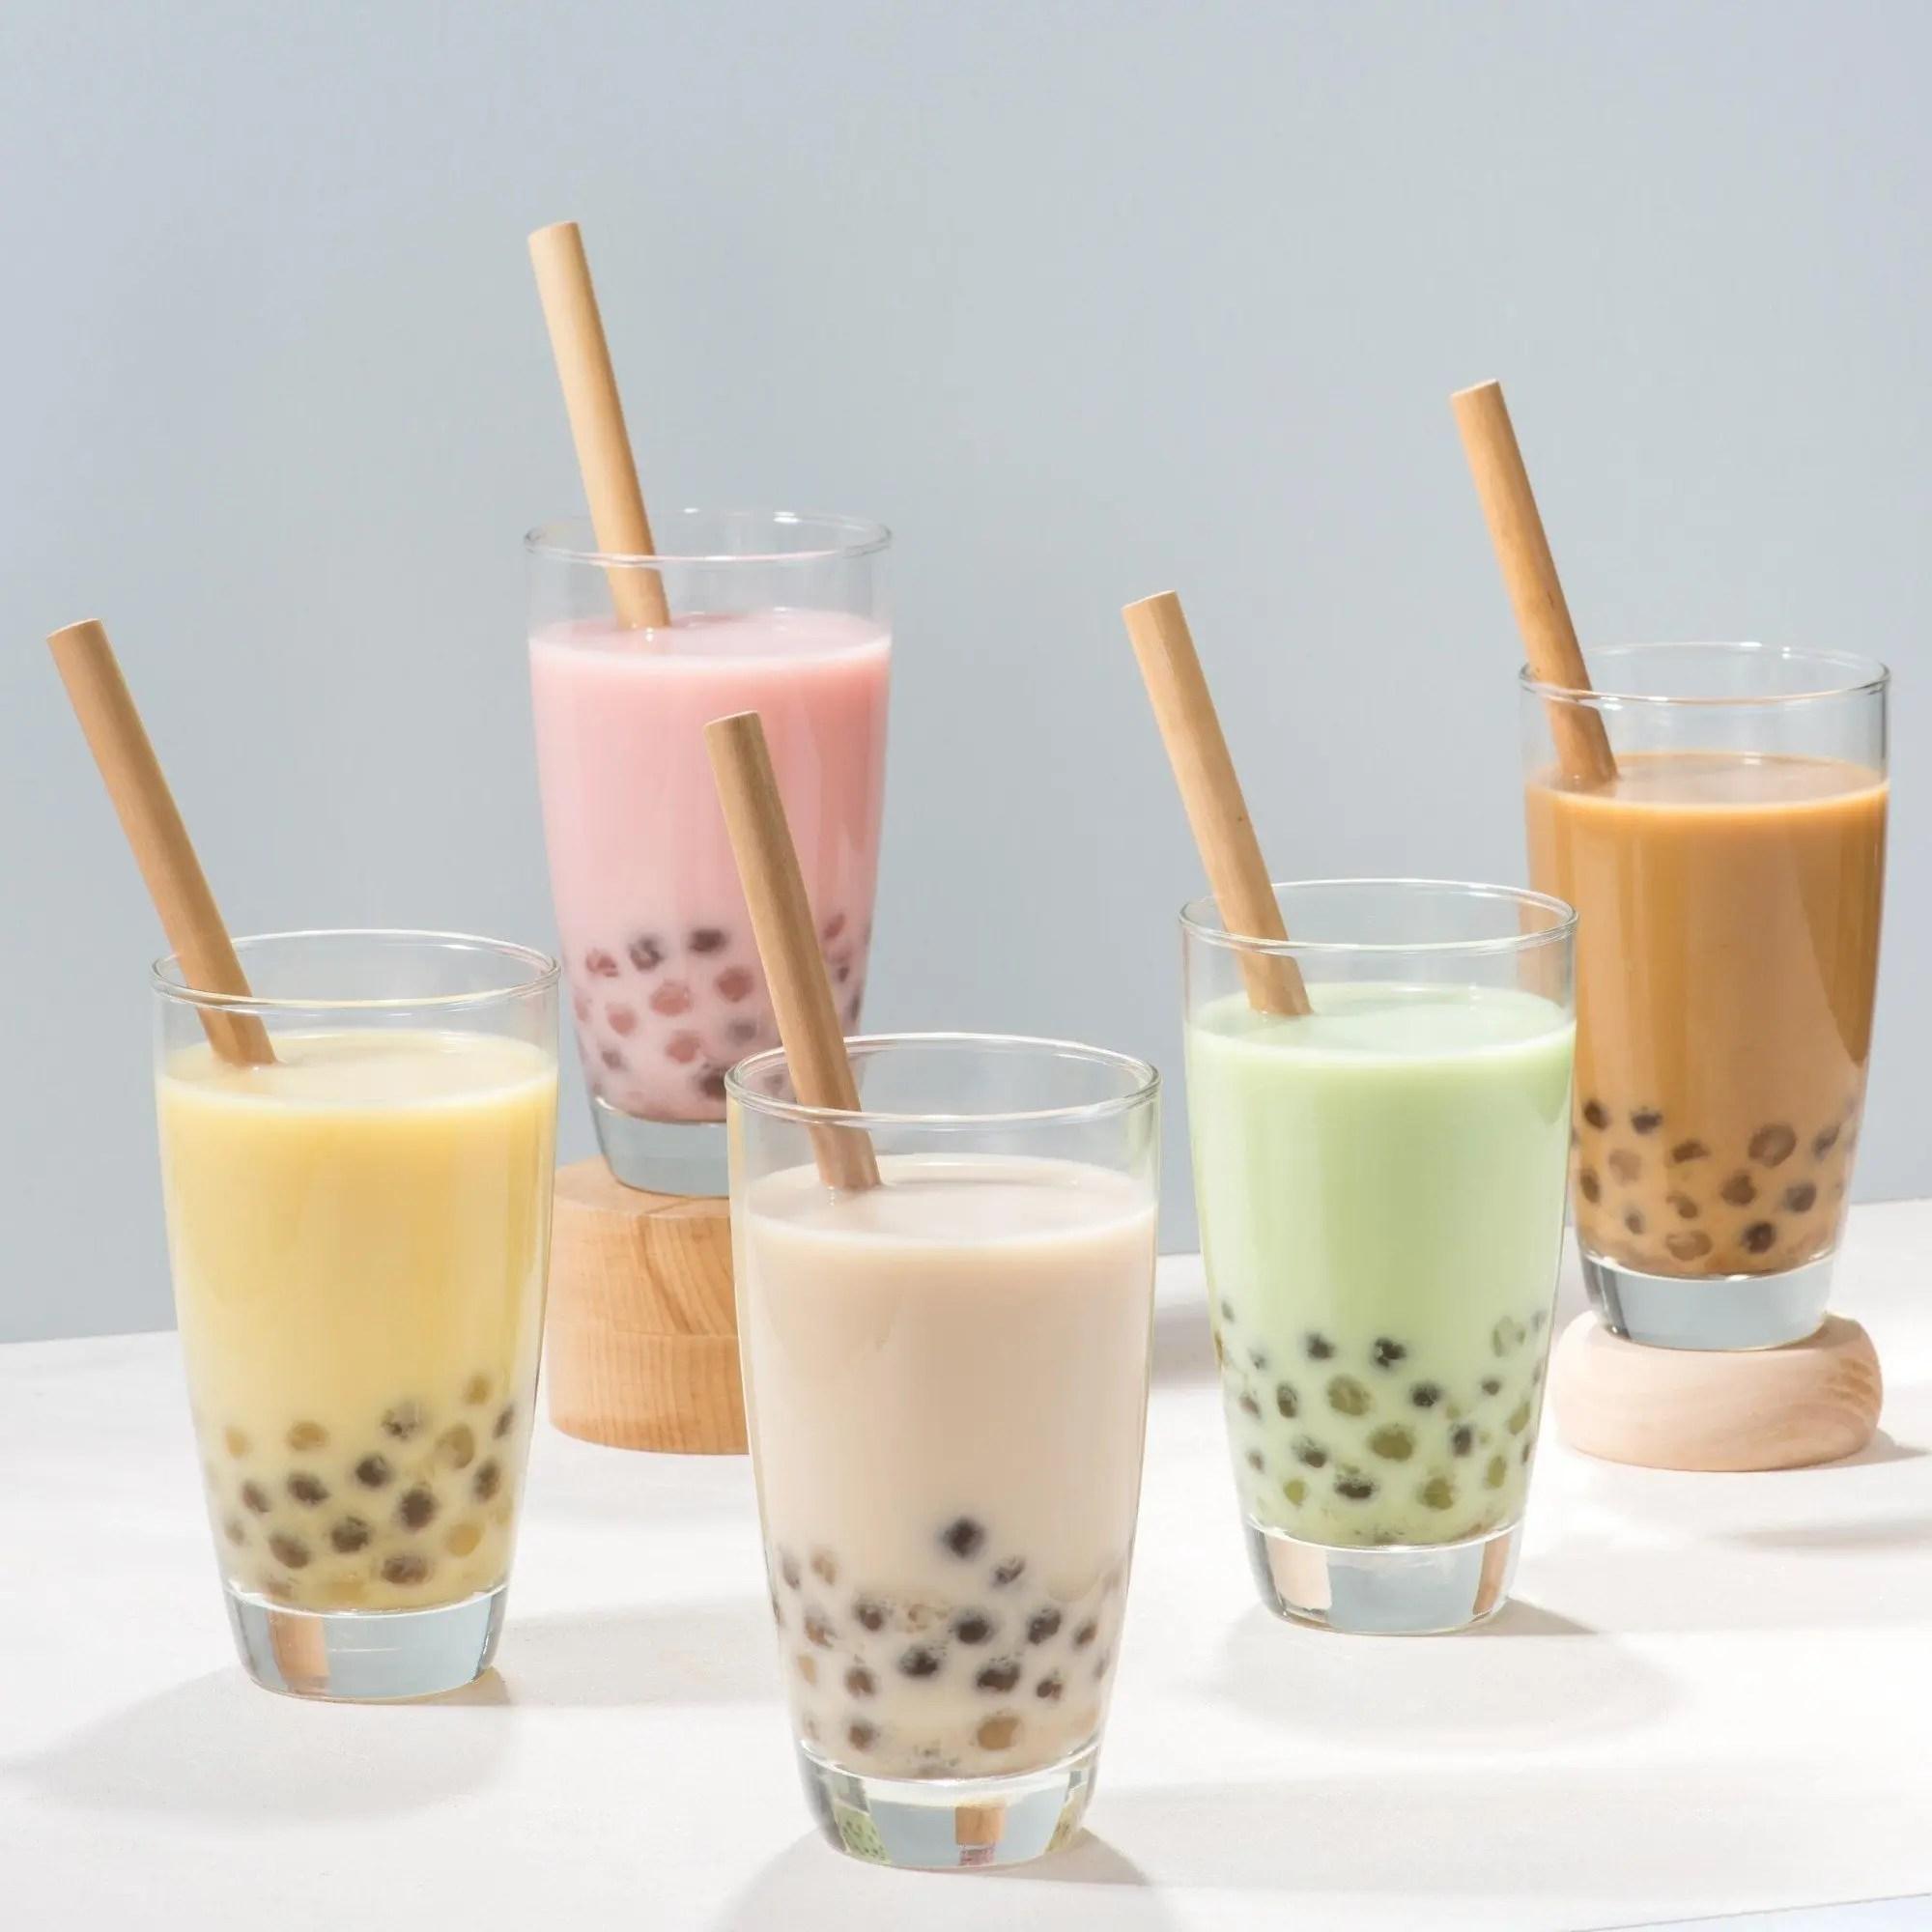 Best Spots for Bubble Tea in Calgary - Lauren's Lighthouse